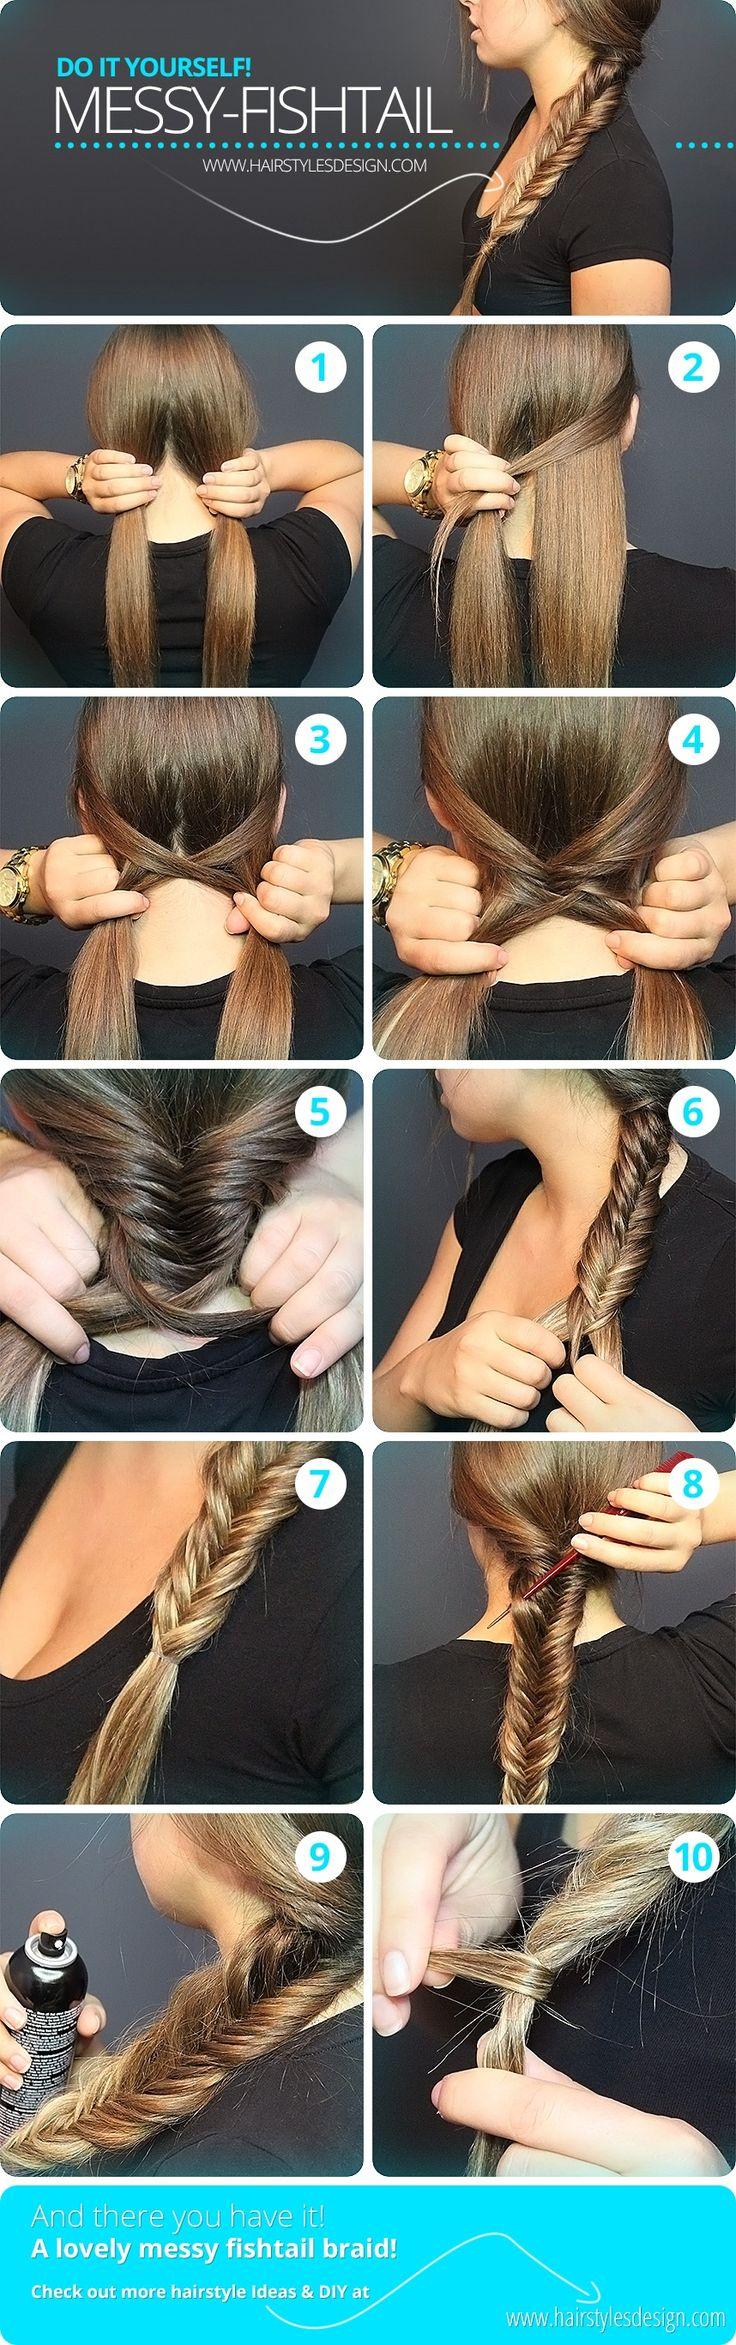 15 diy braided hair tutorials for winter pretty designs messy fishtail solutioingenieria Images